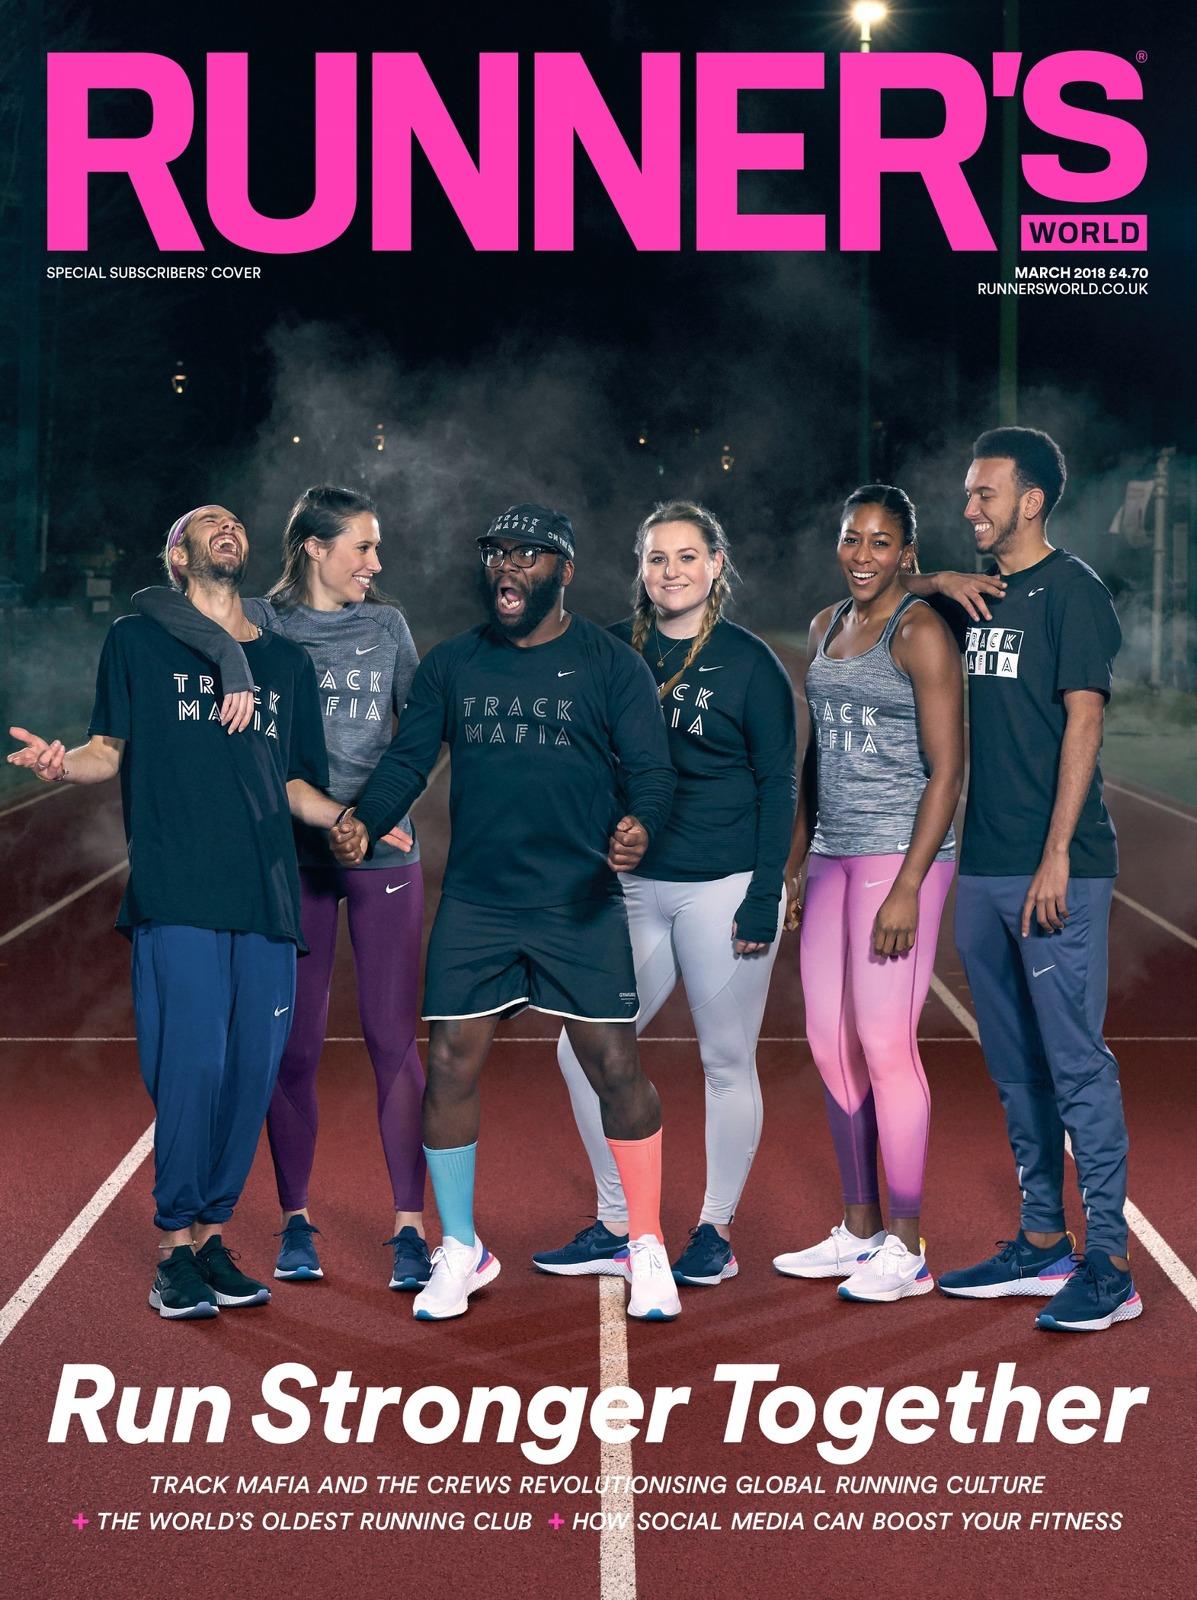 desconocido Amabilidad pedestal  NIKE TRACK MAFIA - RUNNER'S WORLD COVER SHOOTS